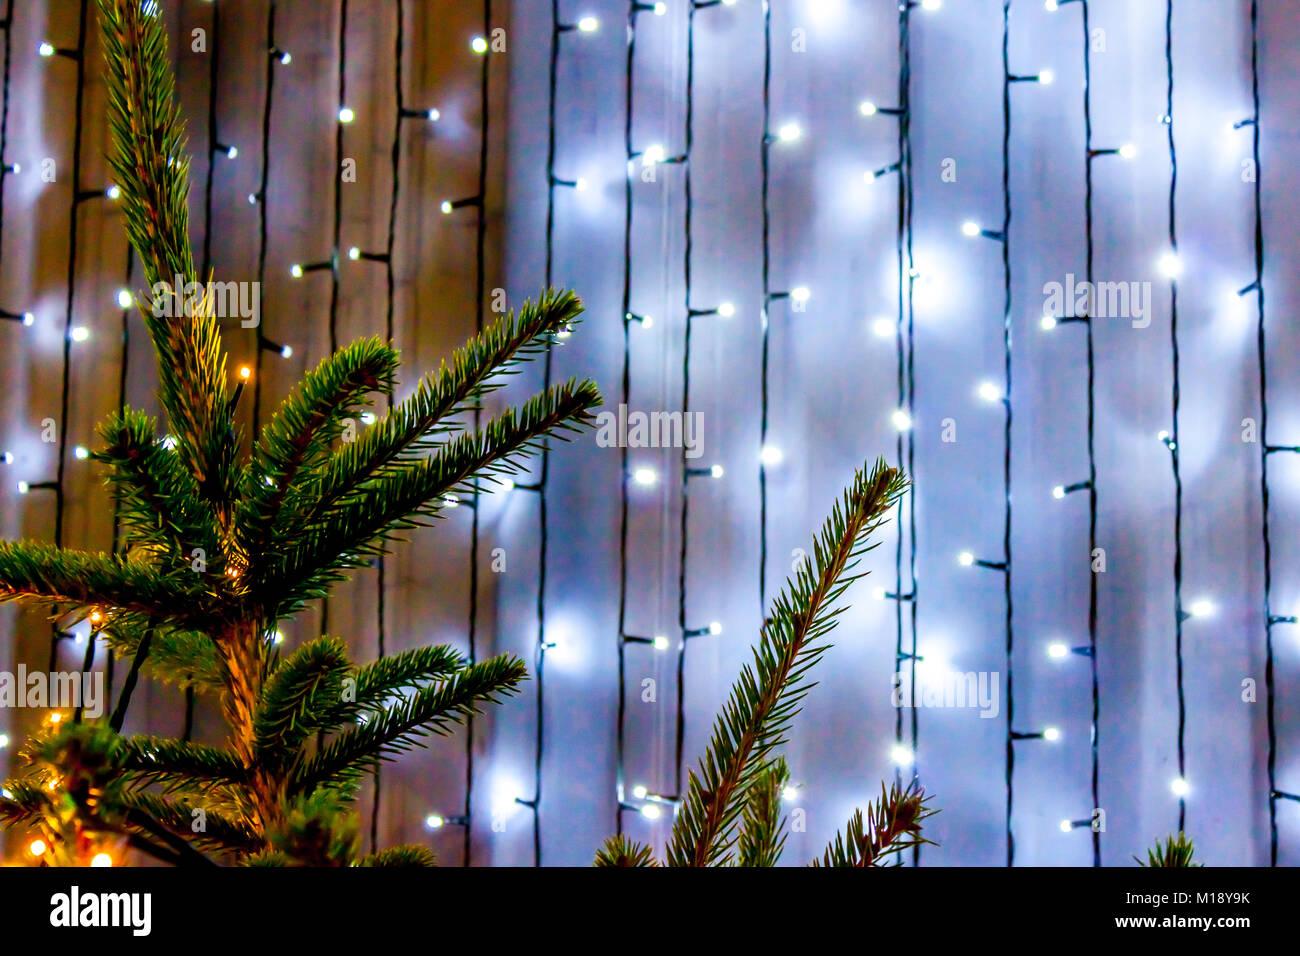 Scotland Christmas Lights Stock Photos & Scotland